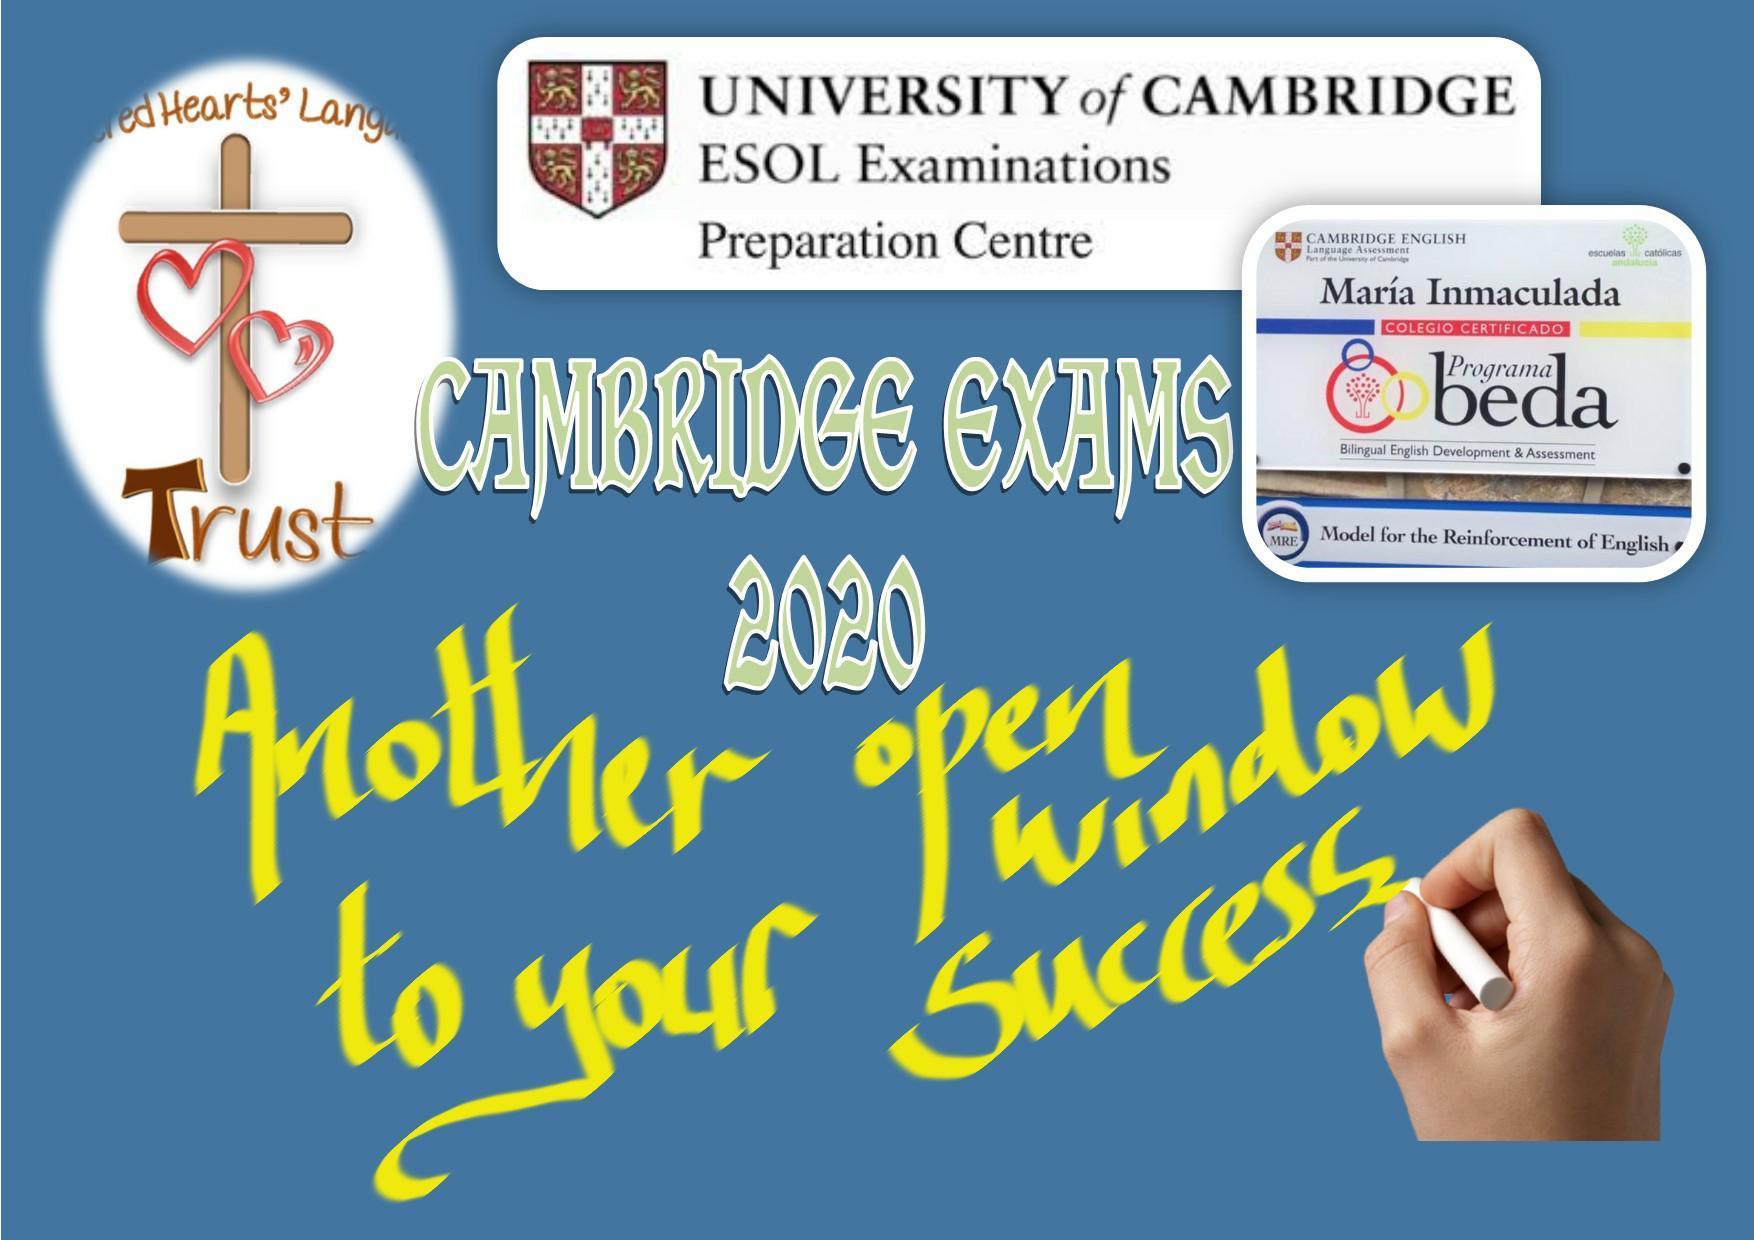 Convocatoria CAMBRIDGE EXAMS 2020